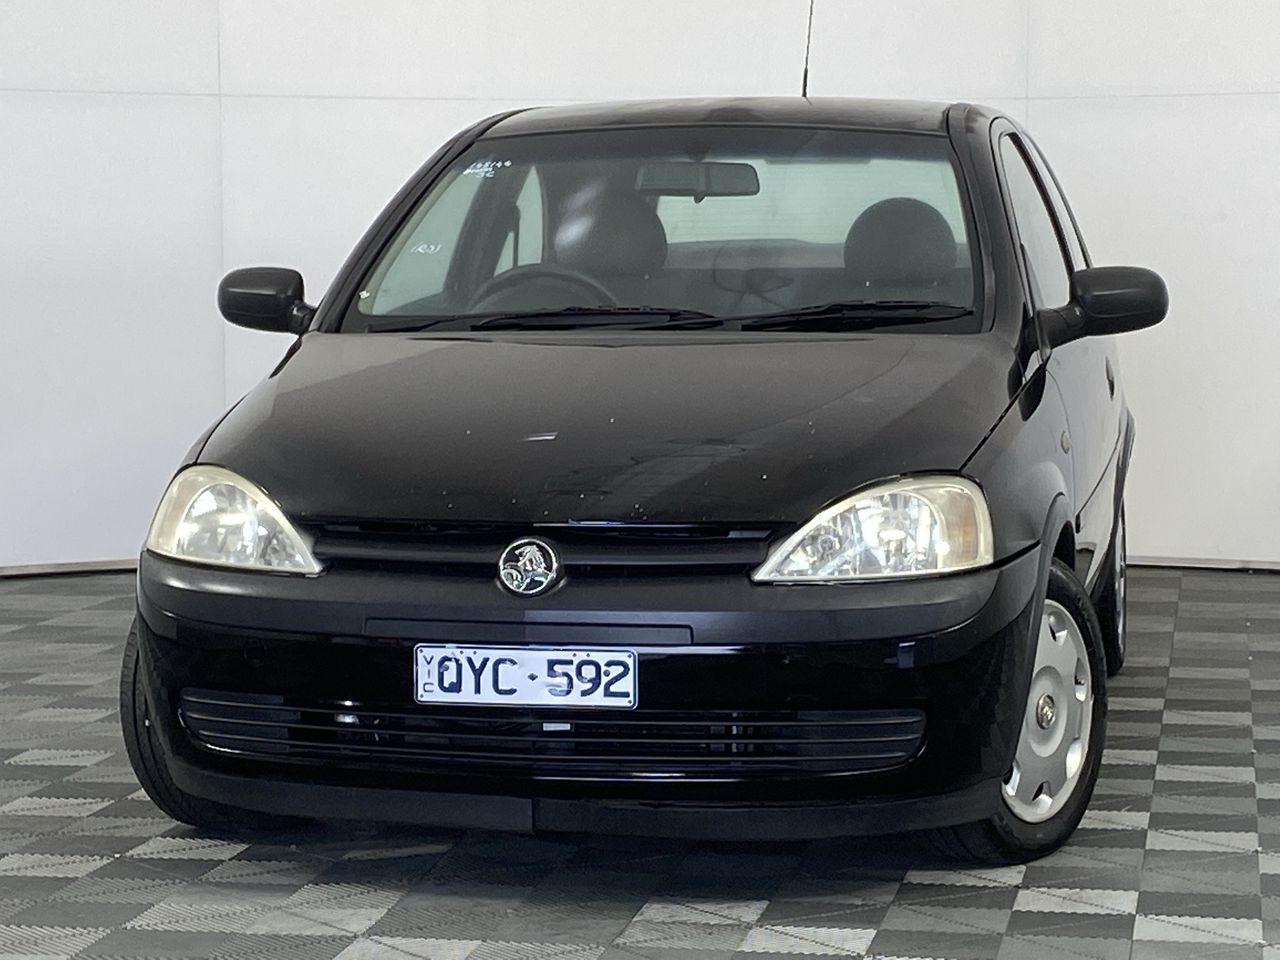 2001 Holden Barina XC Manual Hatchback